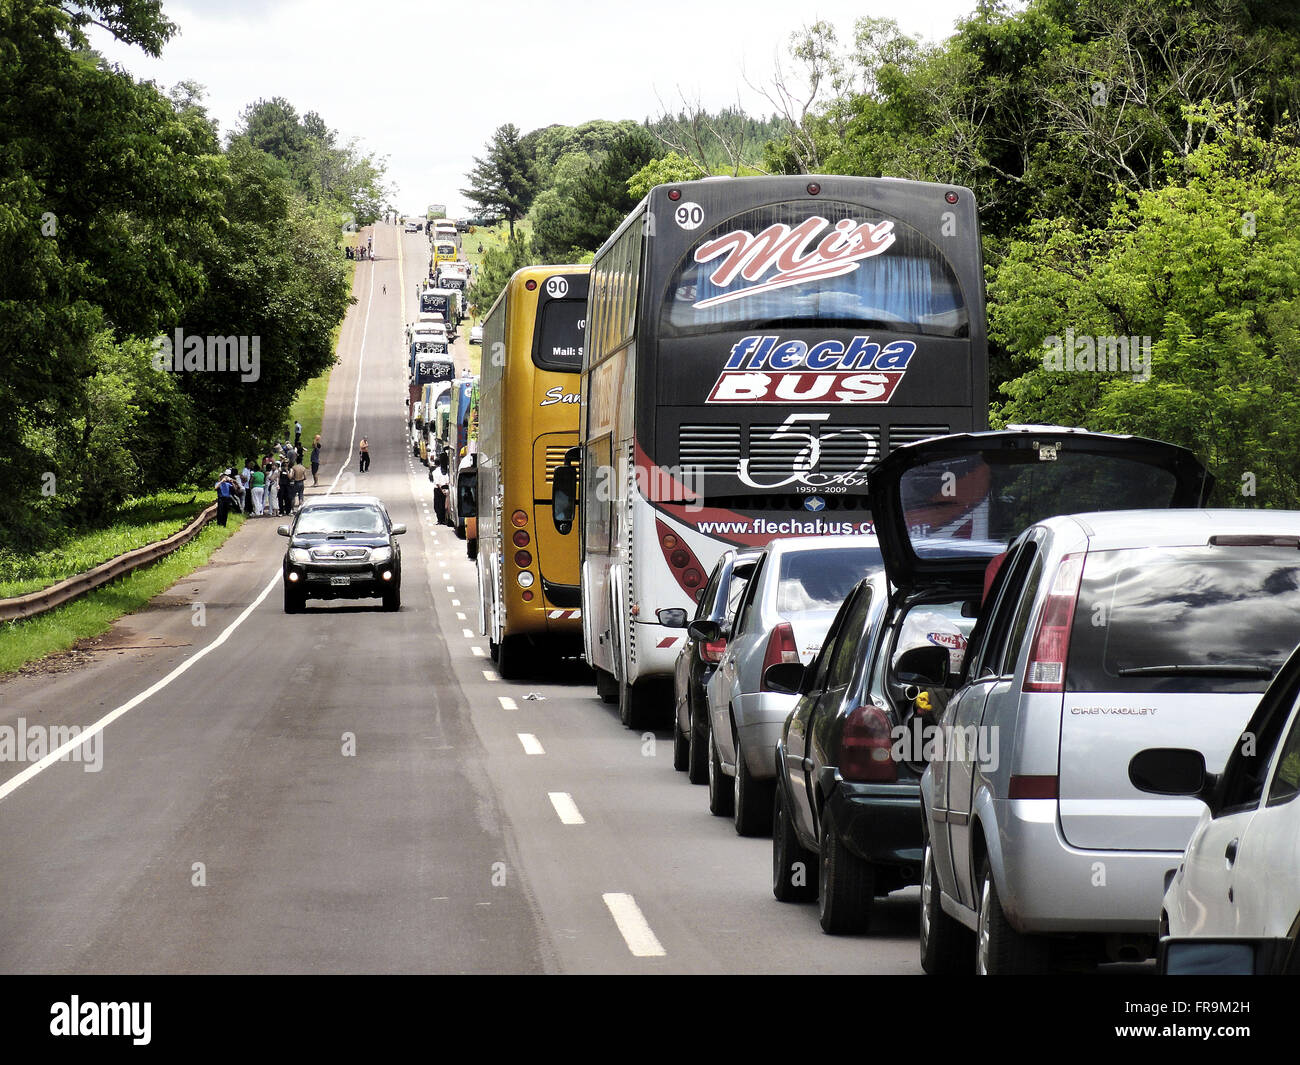 Traffic stopped on Ruta Nacional 12 or 12 RN - Stock Image